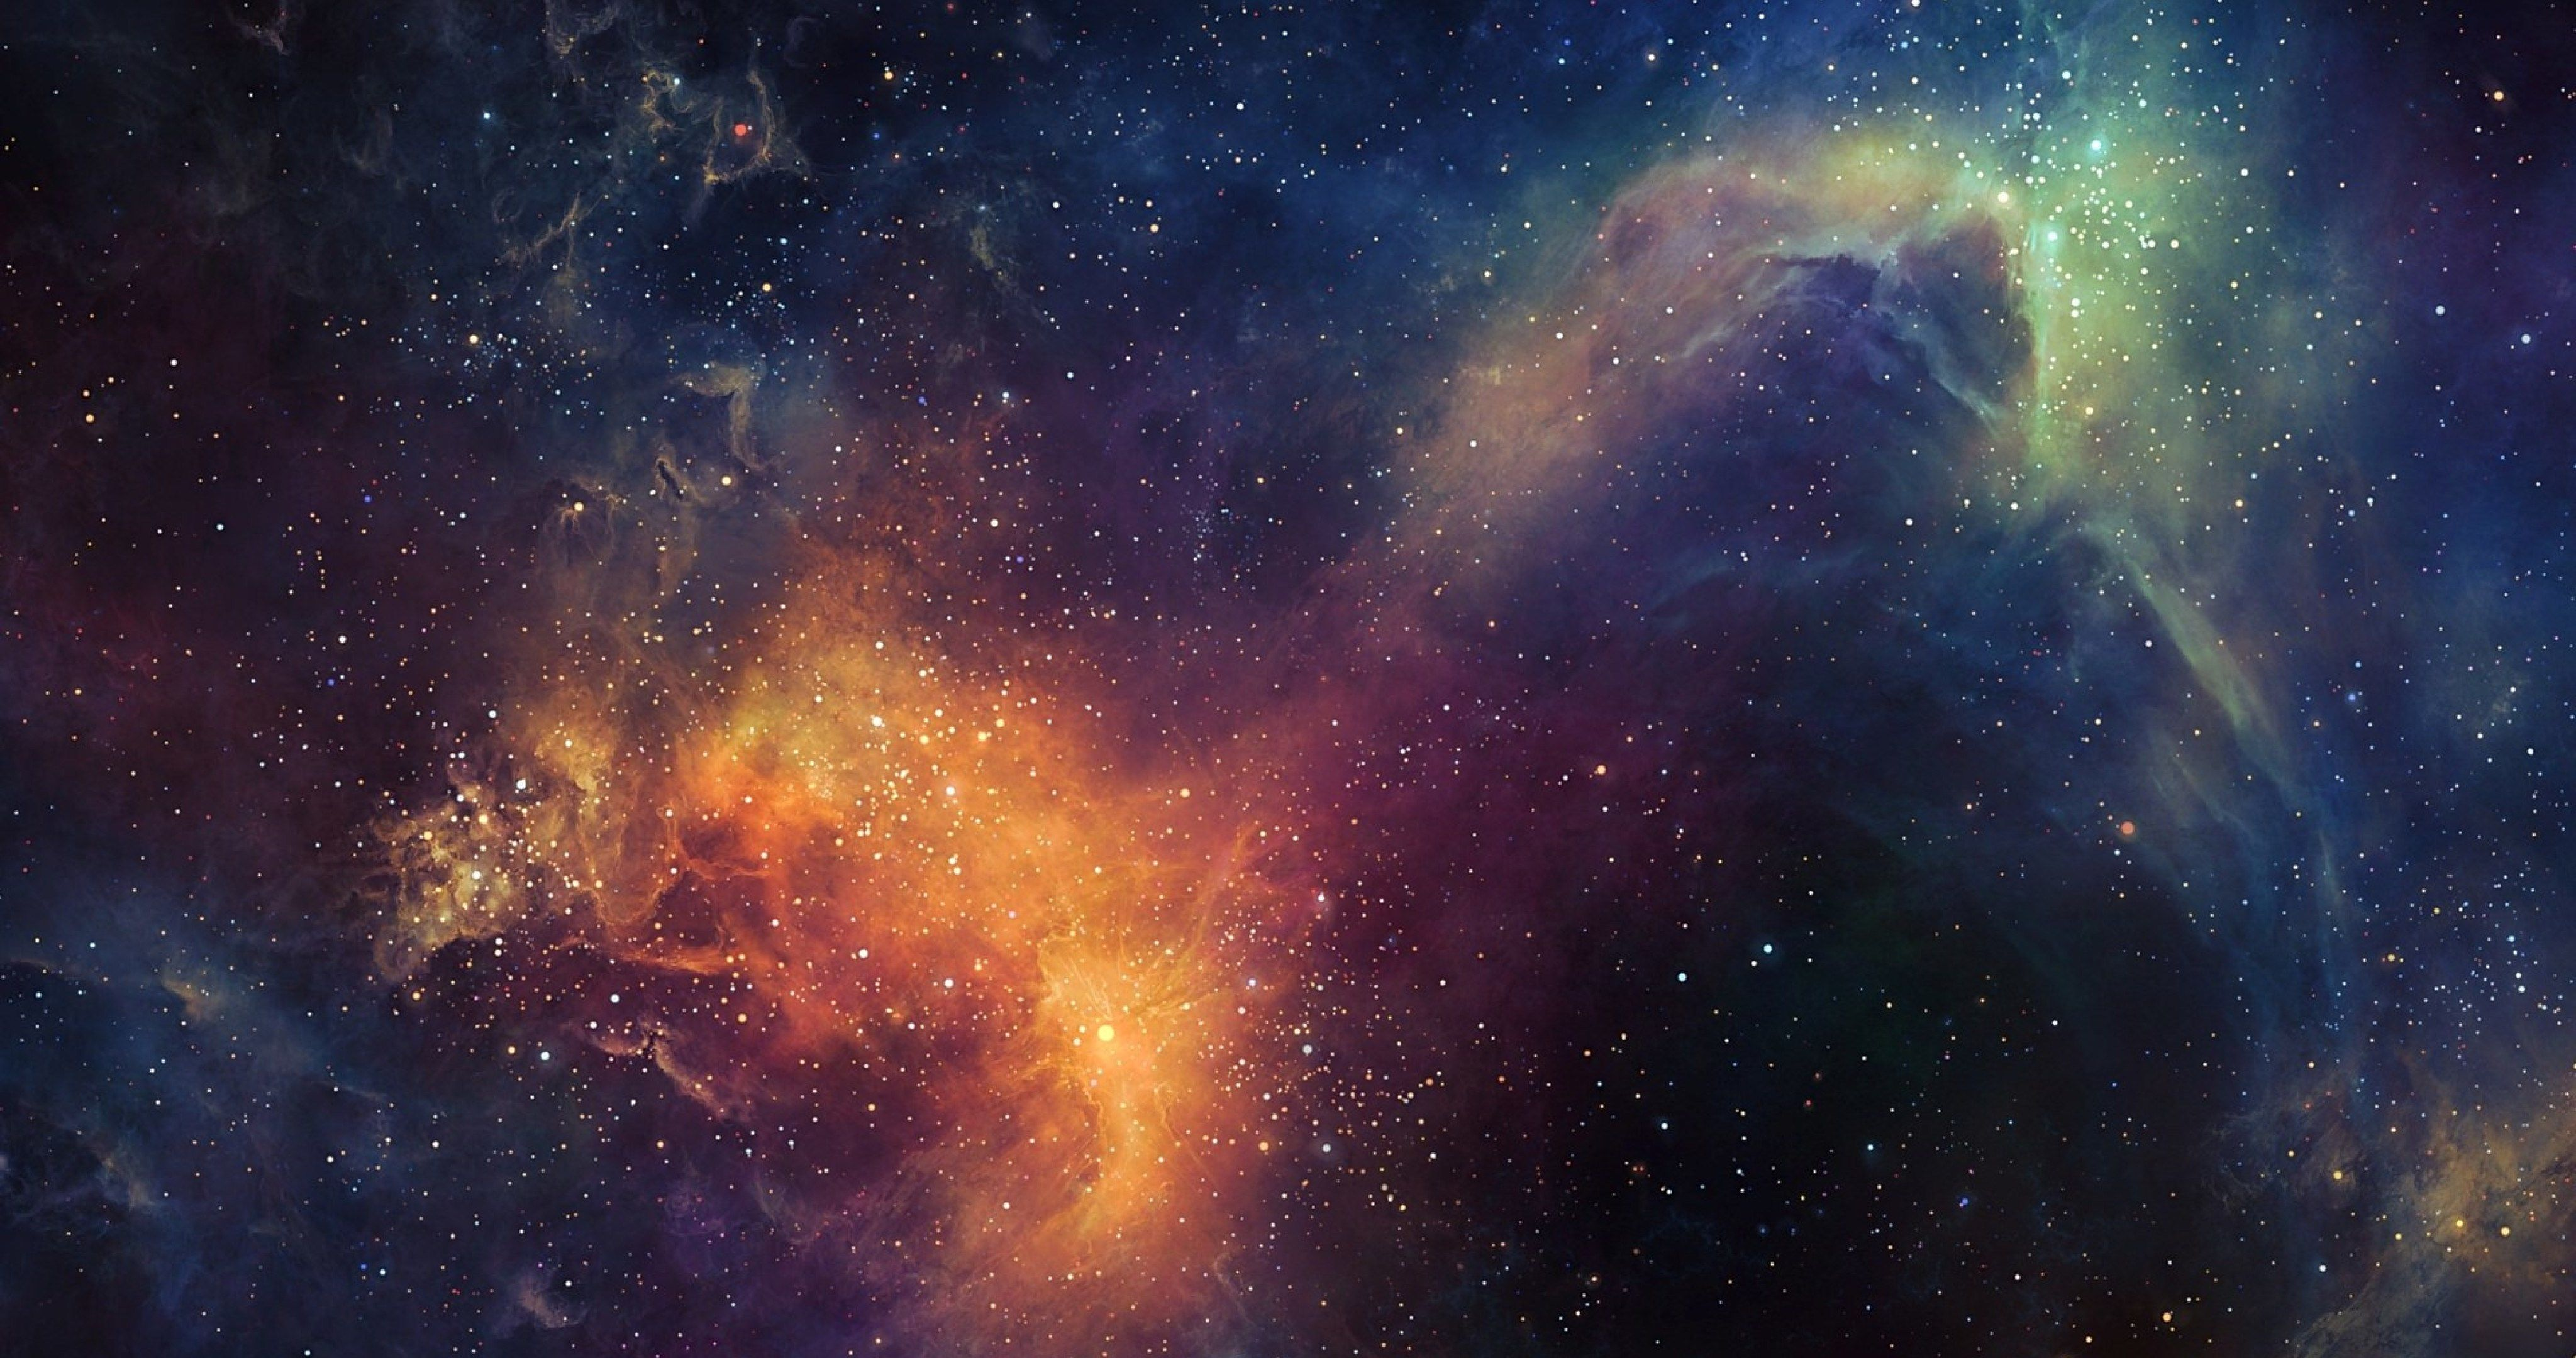 4k Space Wallpaper: 4K Ultra HD Space Wallpapers